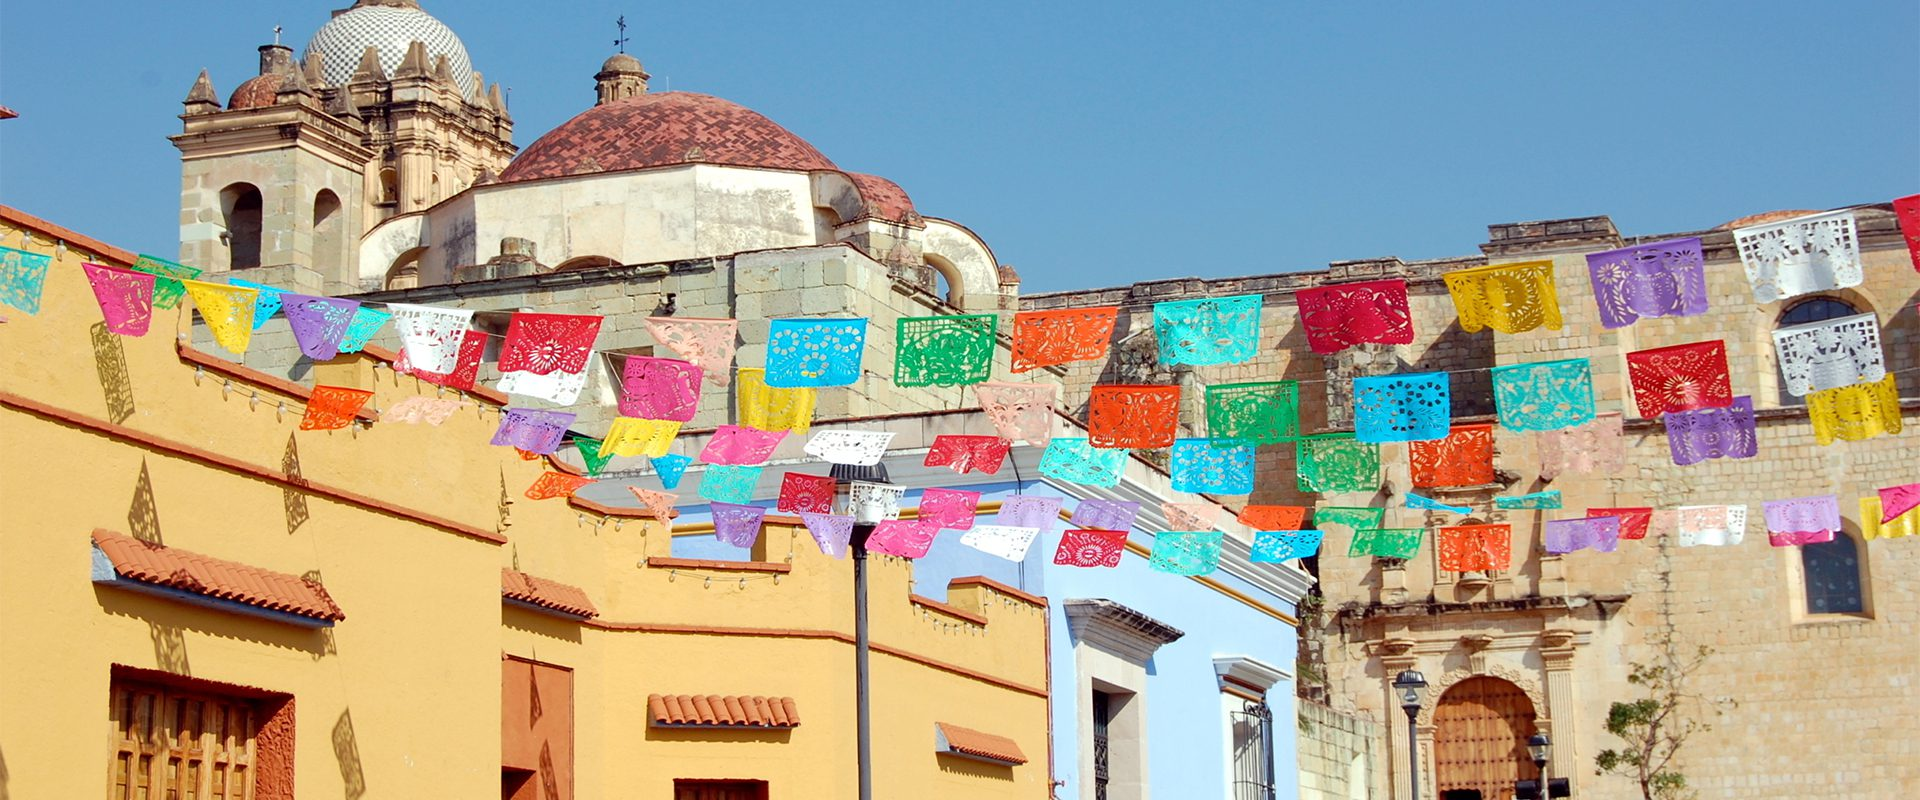 Oaxaca - Viajeros con B